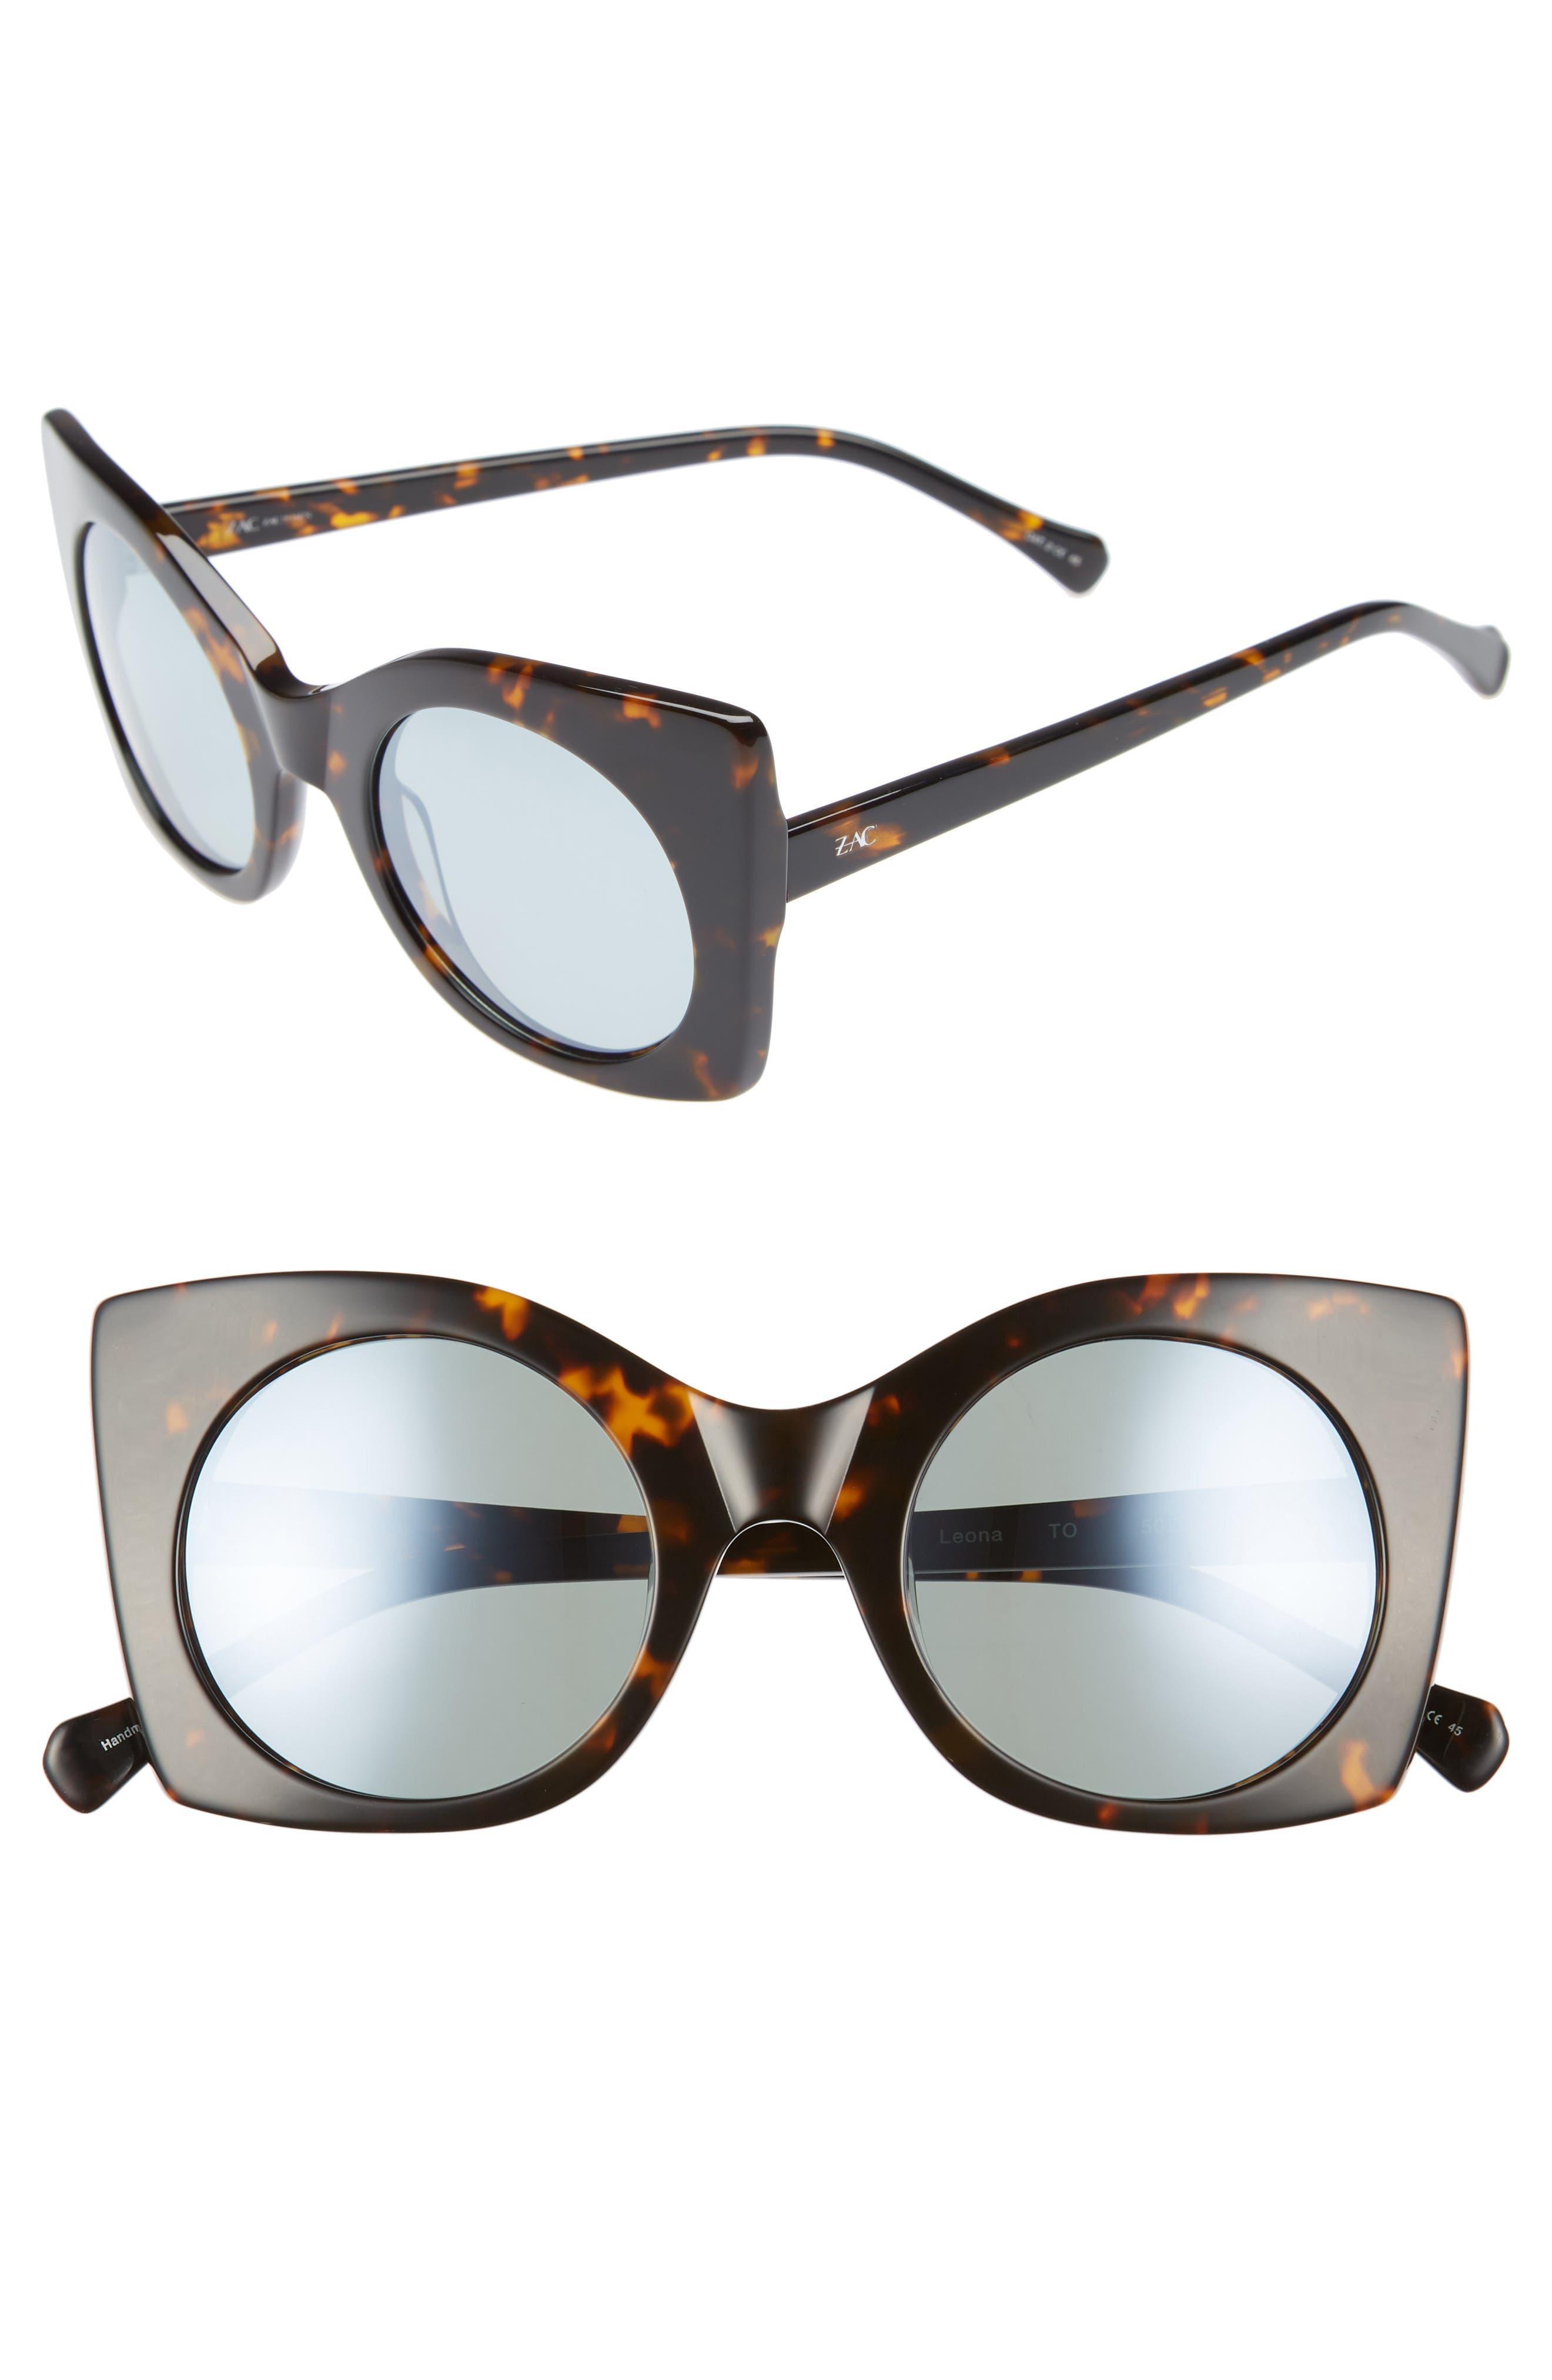 Zac Zac Posen Leona 50mm Polarized Sunglasses